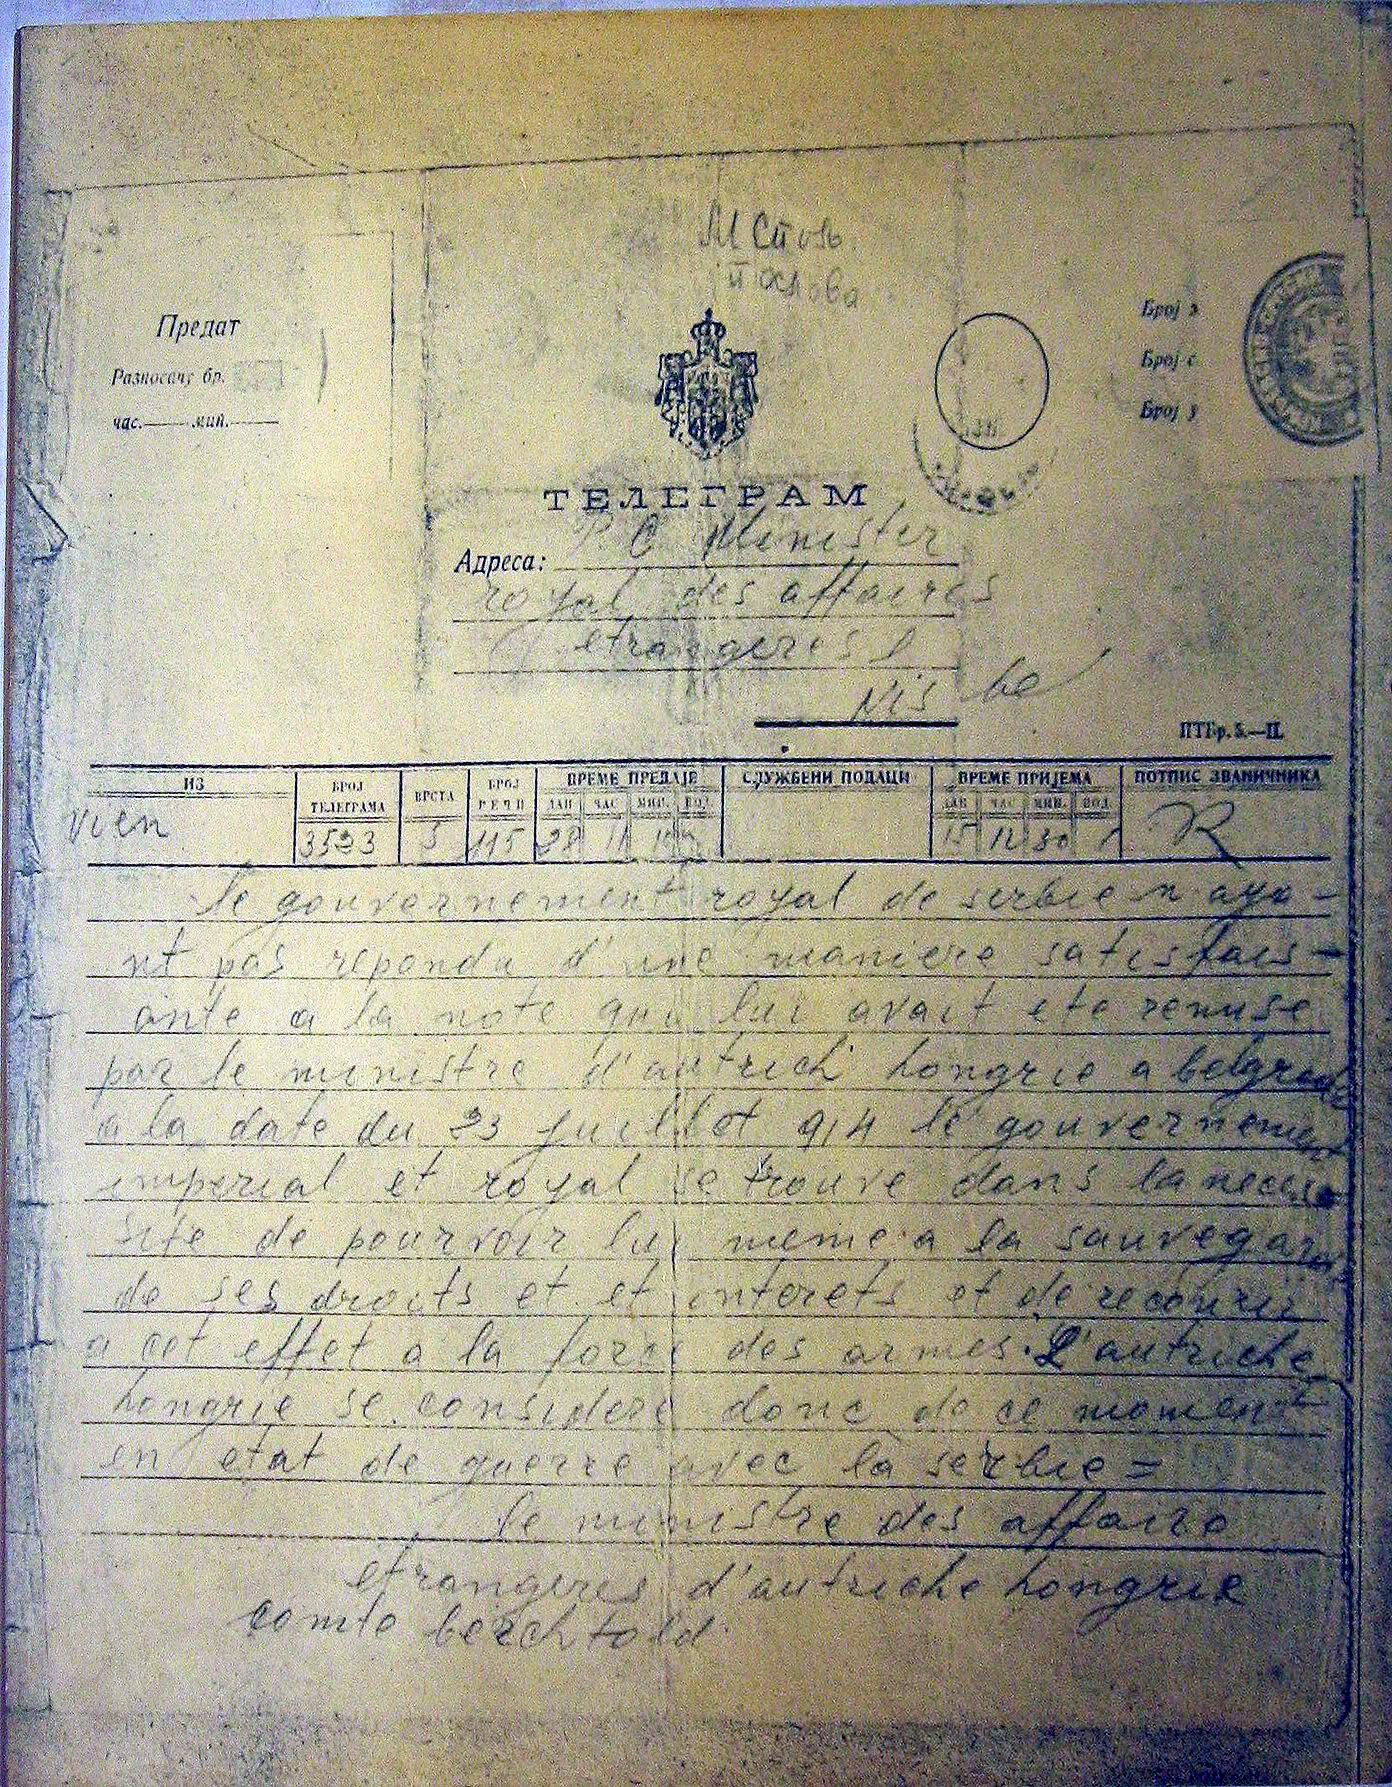 Declaration of War telegram from Austria-Hungary to Serbia